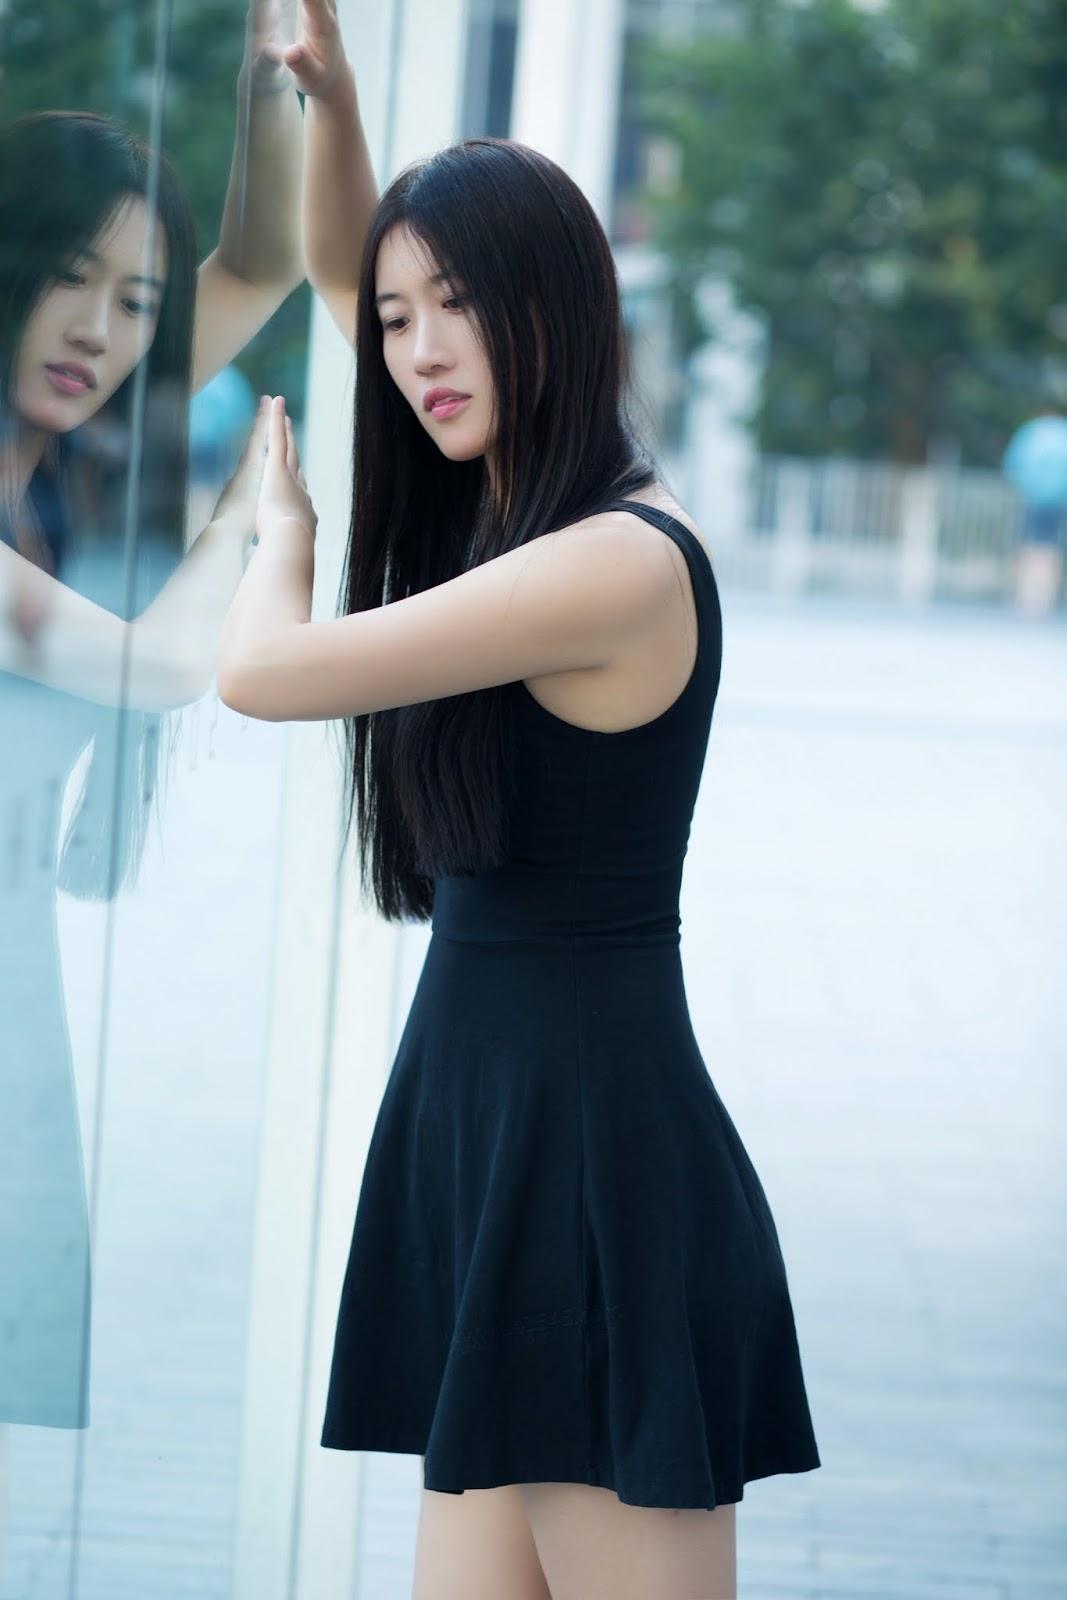 Jessica%2B%252826%2529 - TuiGirl No.60